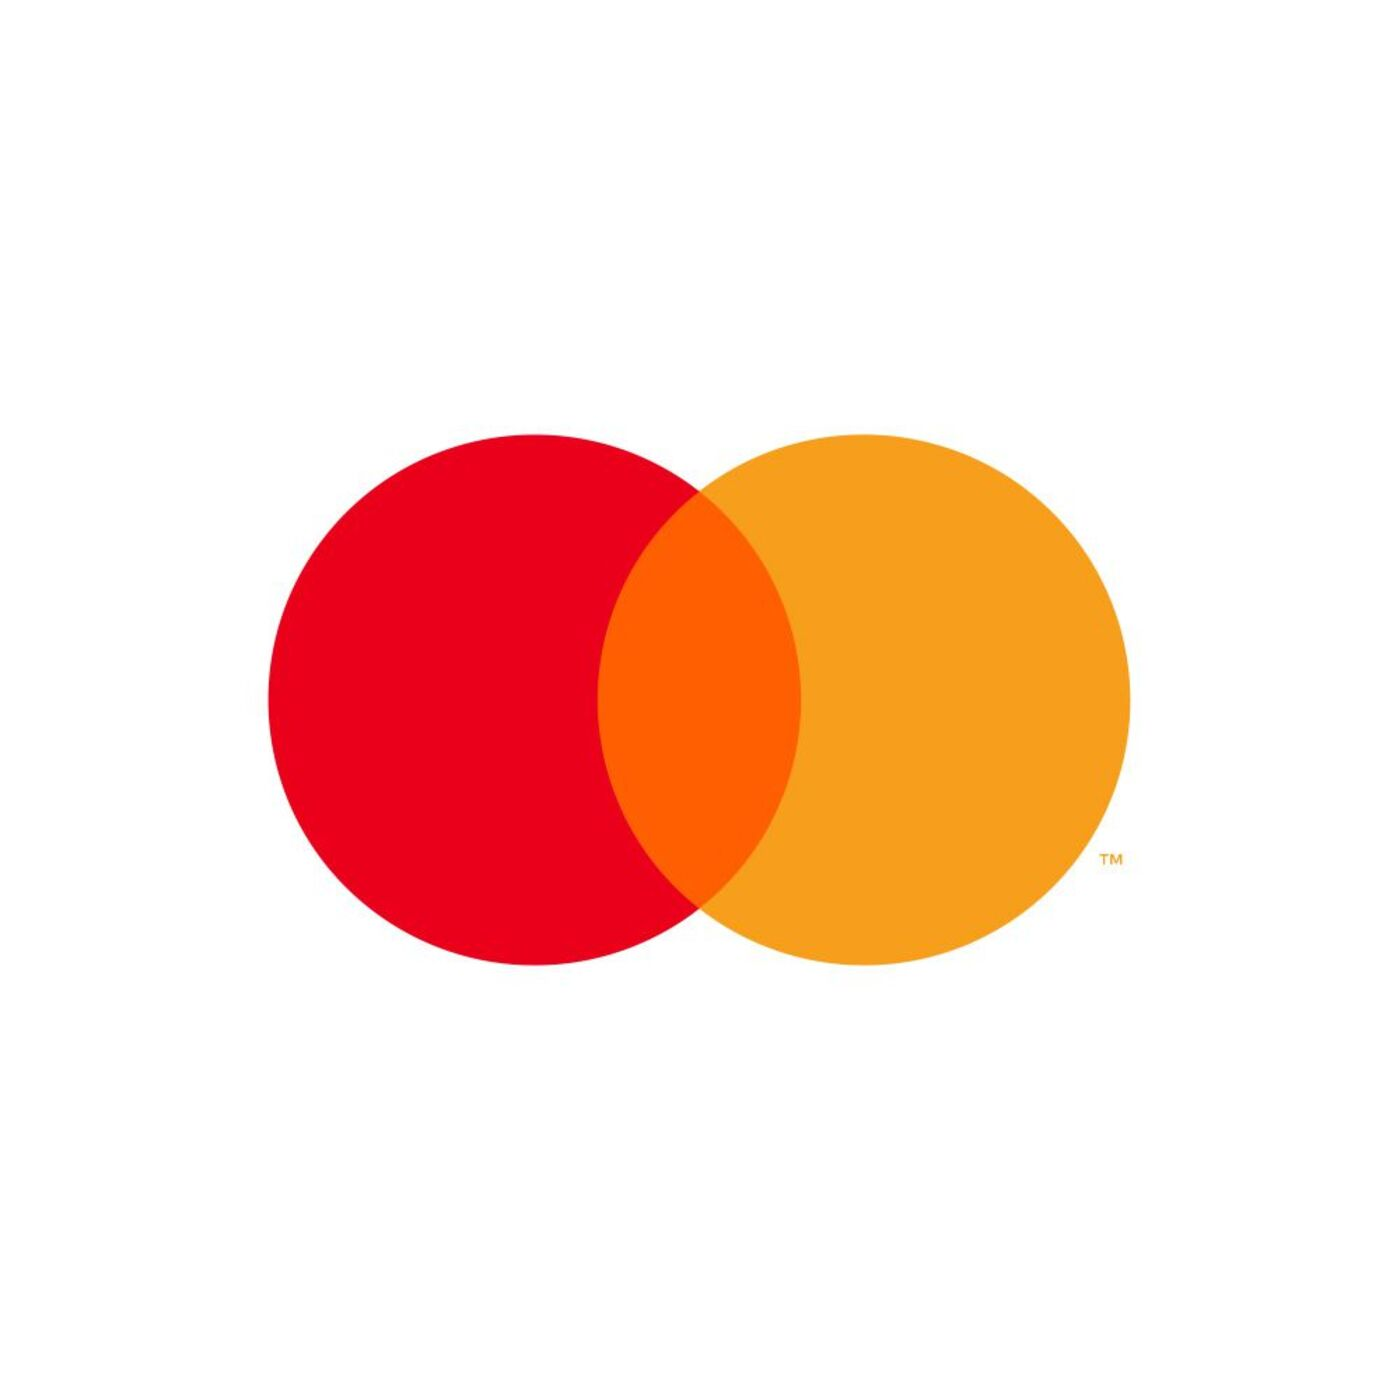 The MasterCard Symbol